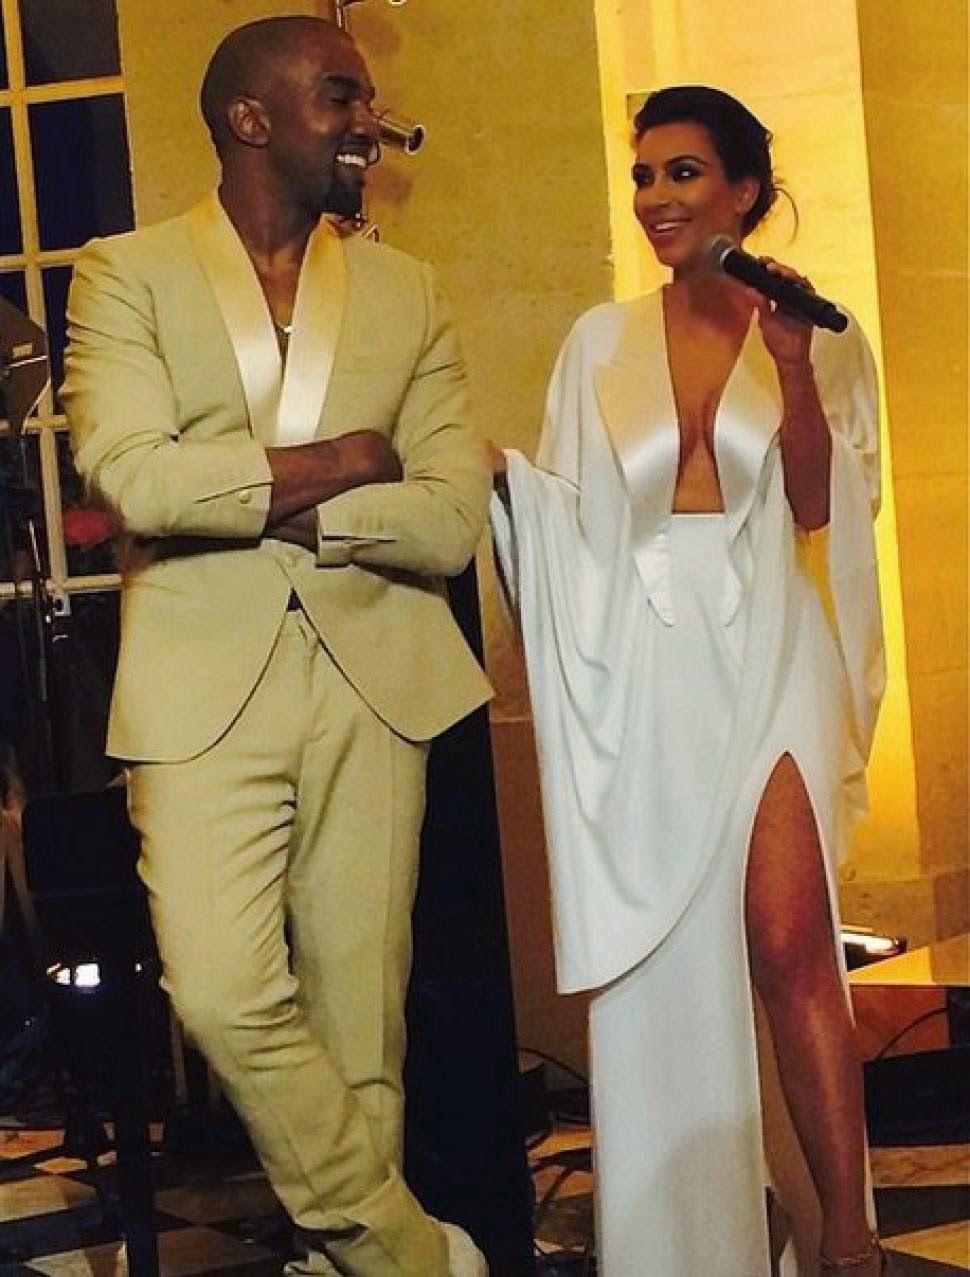 Vnewsus Blogspot Com Kim Kardashian Kanye West Wedding Celeb Guests Descend On Rehears Kim Kardashian Wedding Dress Kim Kardashian Wedding Kim Kanye Wedding